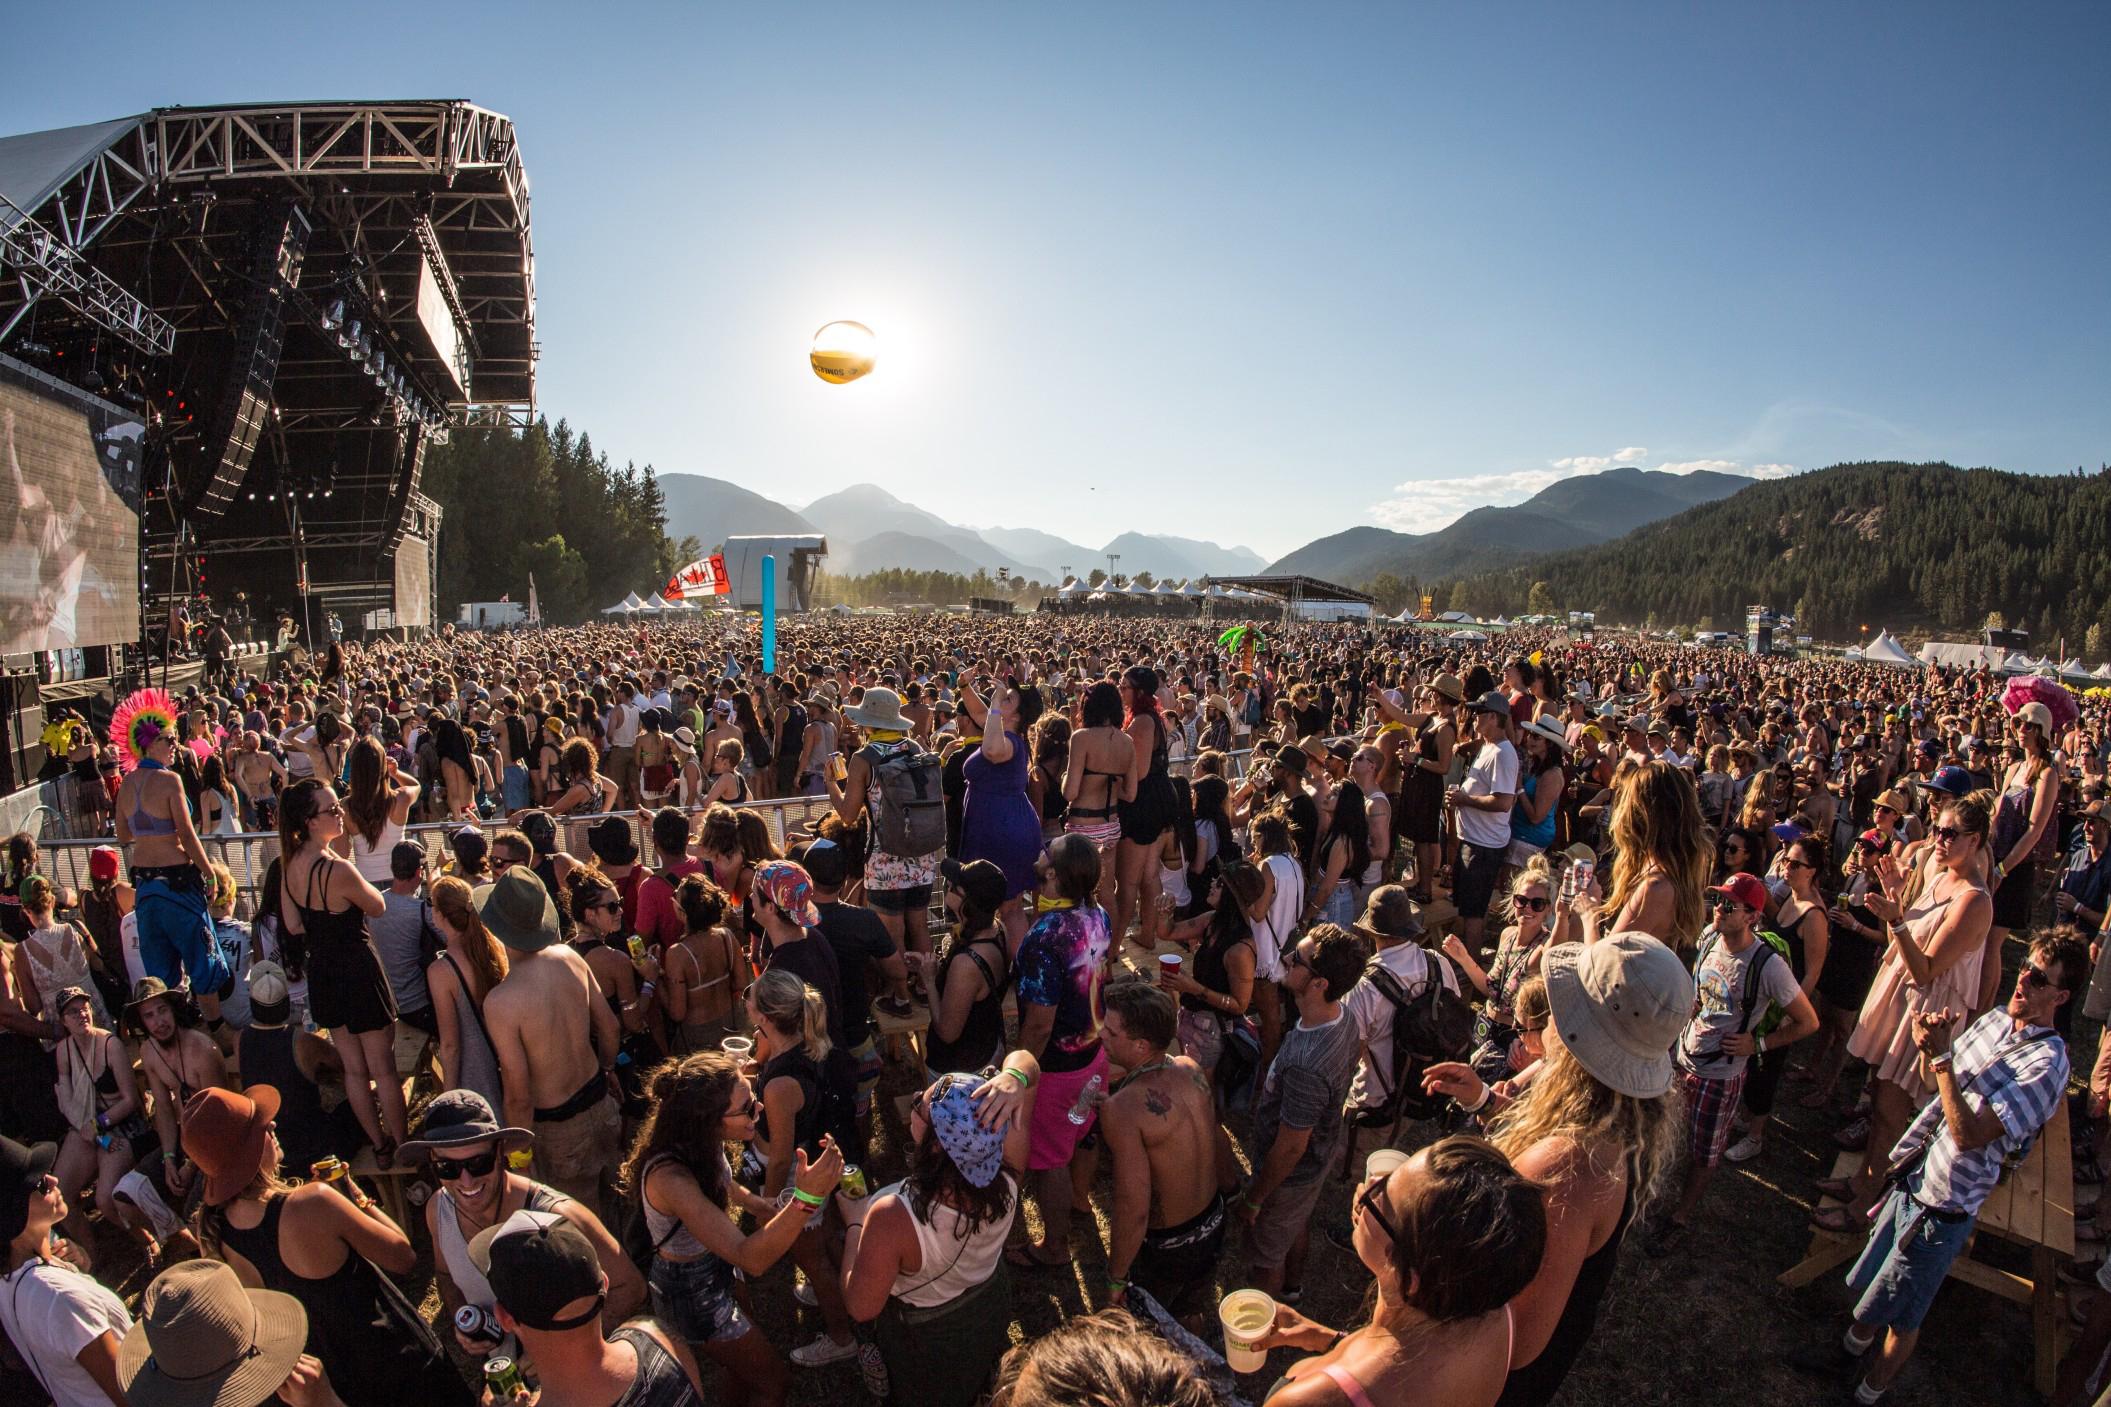 Aerial crowd shot of Splendour in the Grass festival